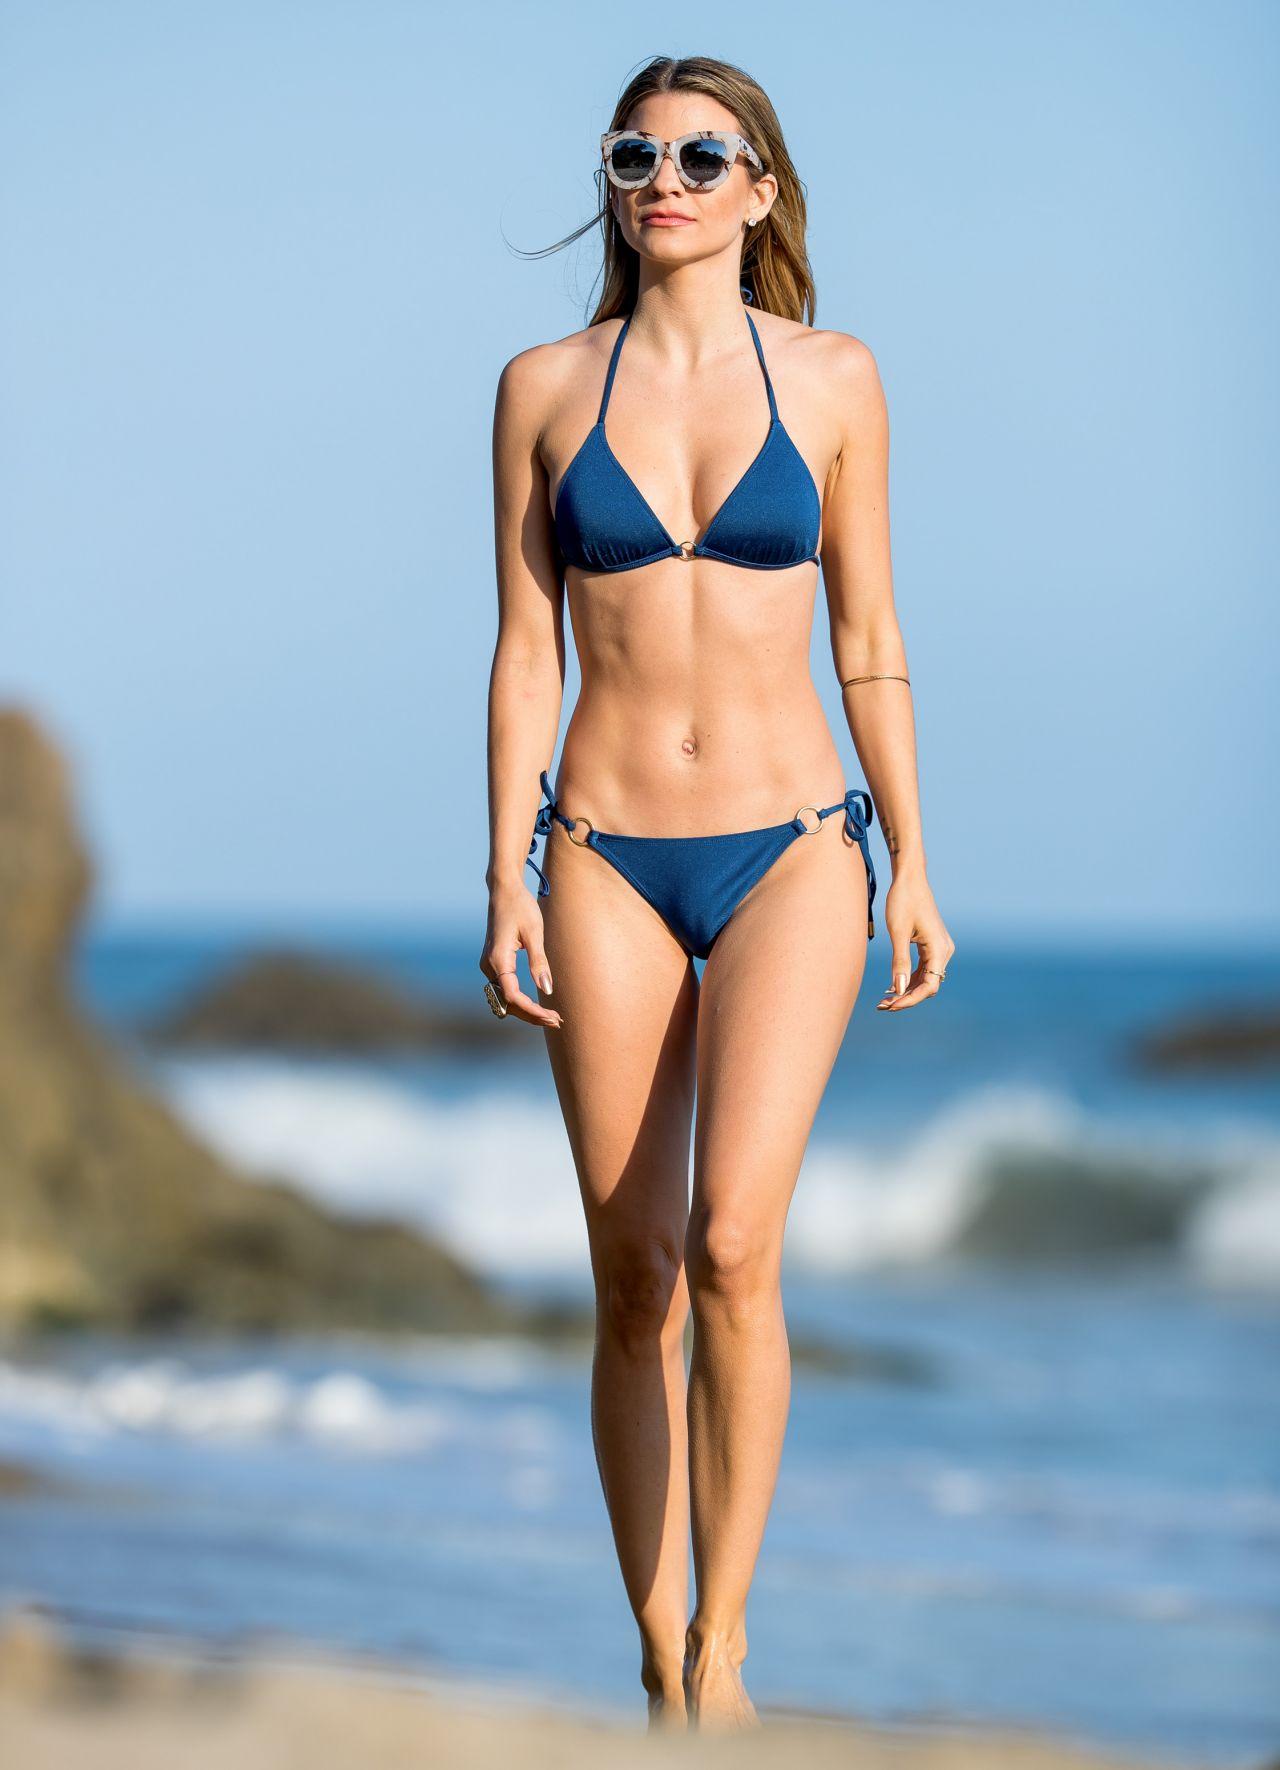 Rachel McCord in a Bikini at the Beach in Los Angeles, 5 ...  Rachel Potter Bikini